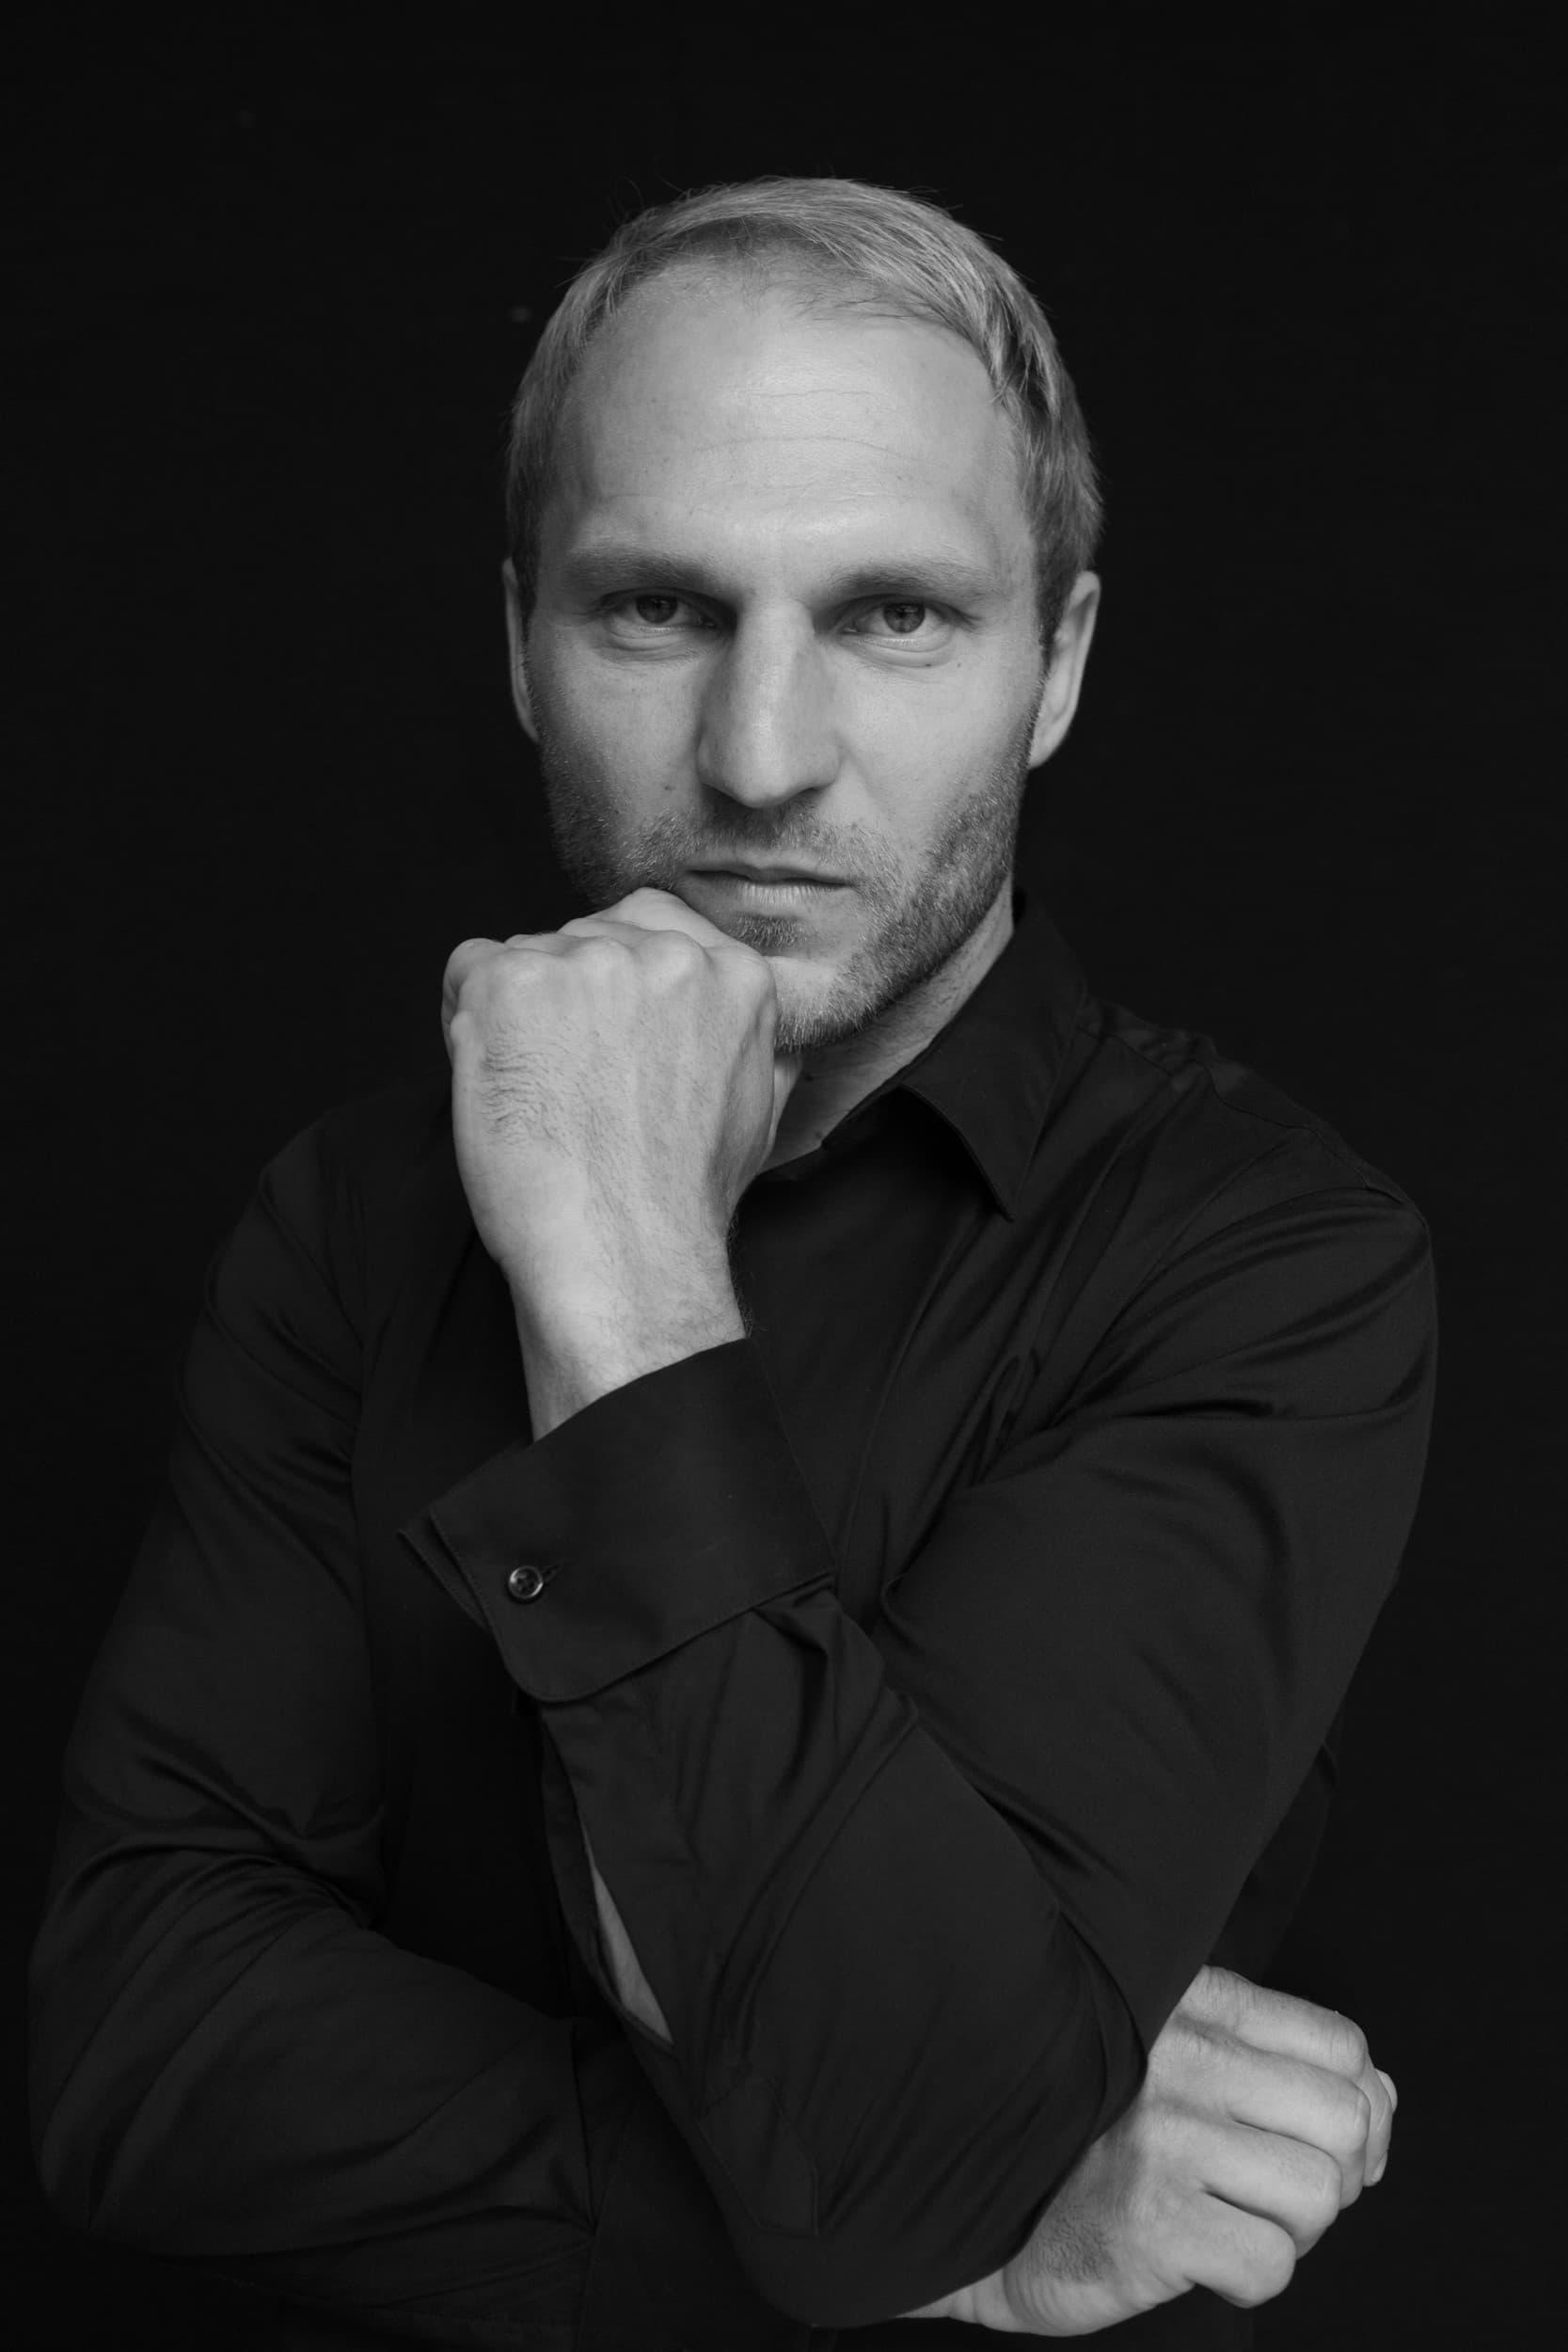 Tomas Zaibus